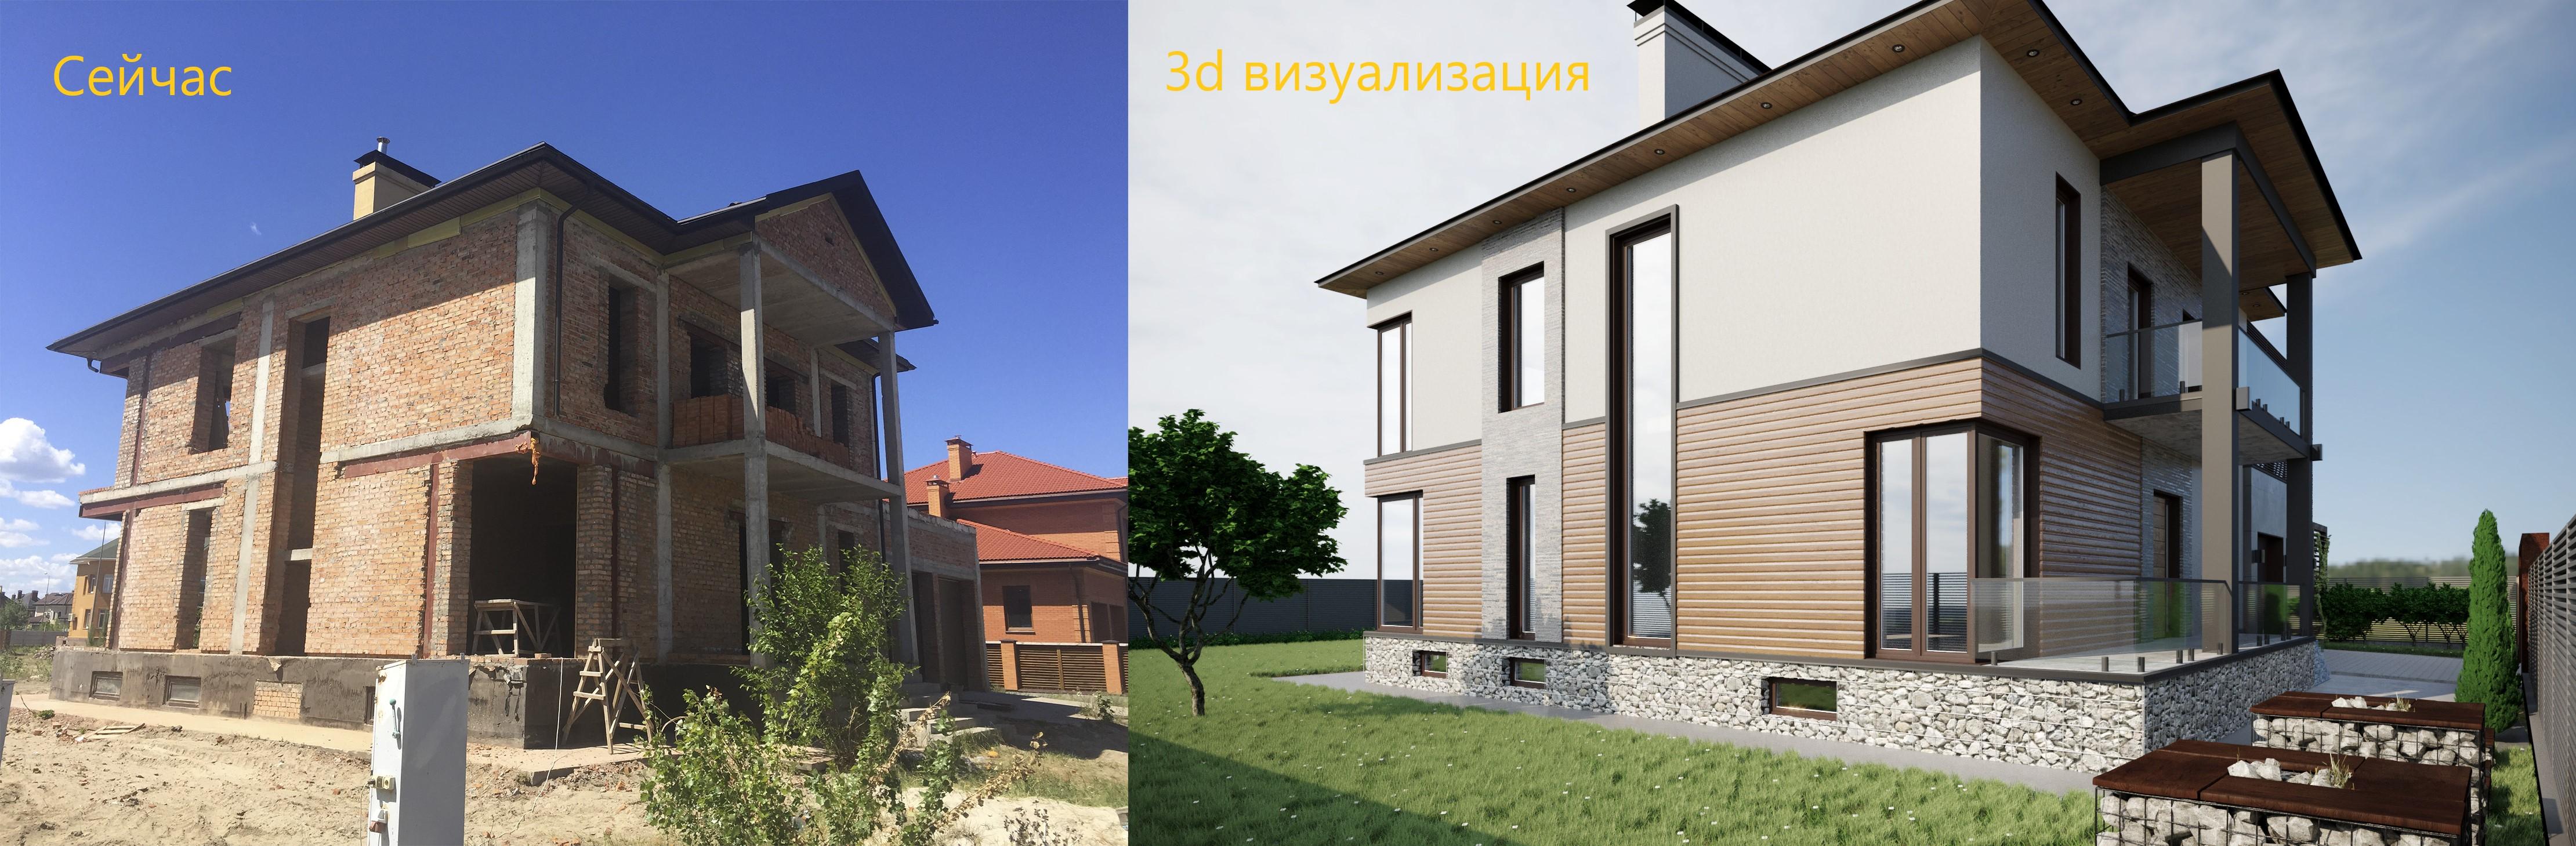 Дизайн проект. Ирина Терещенко. Троещина, слайд 2